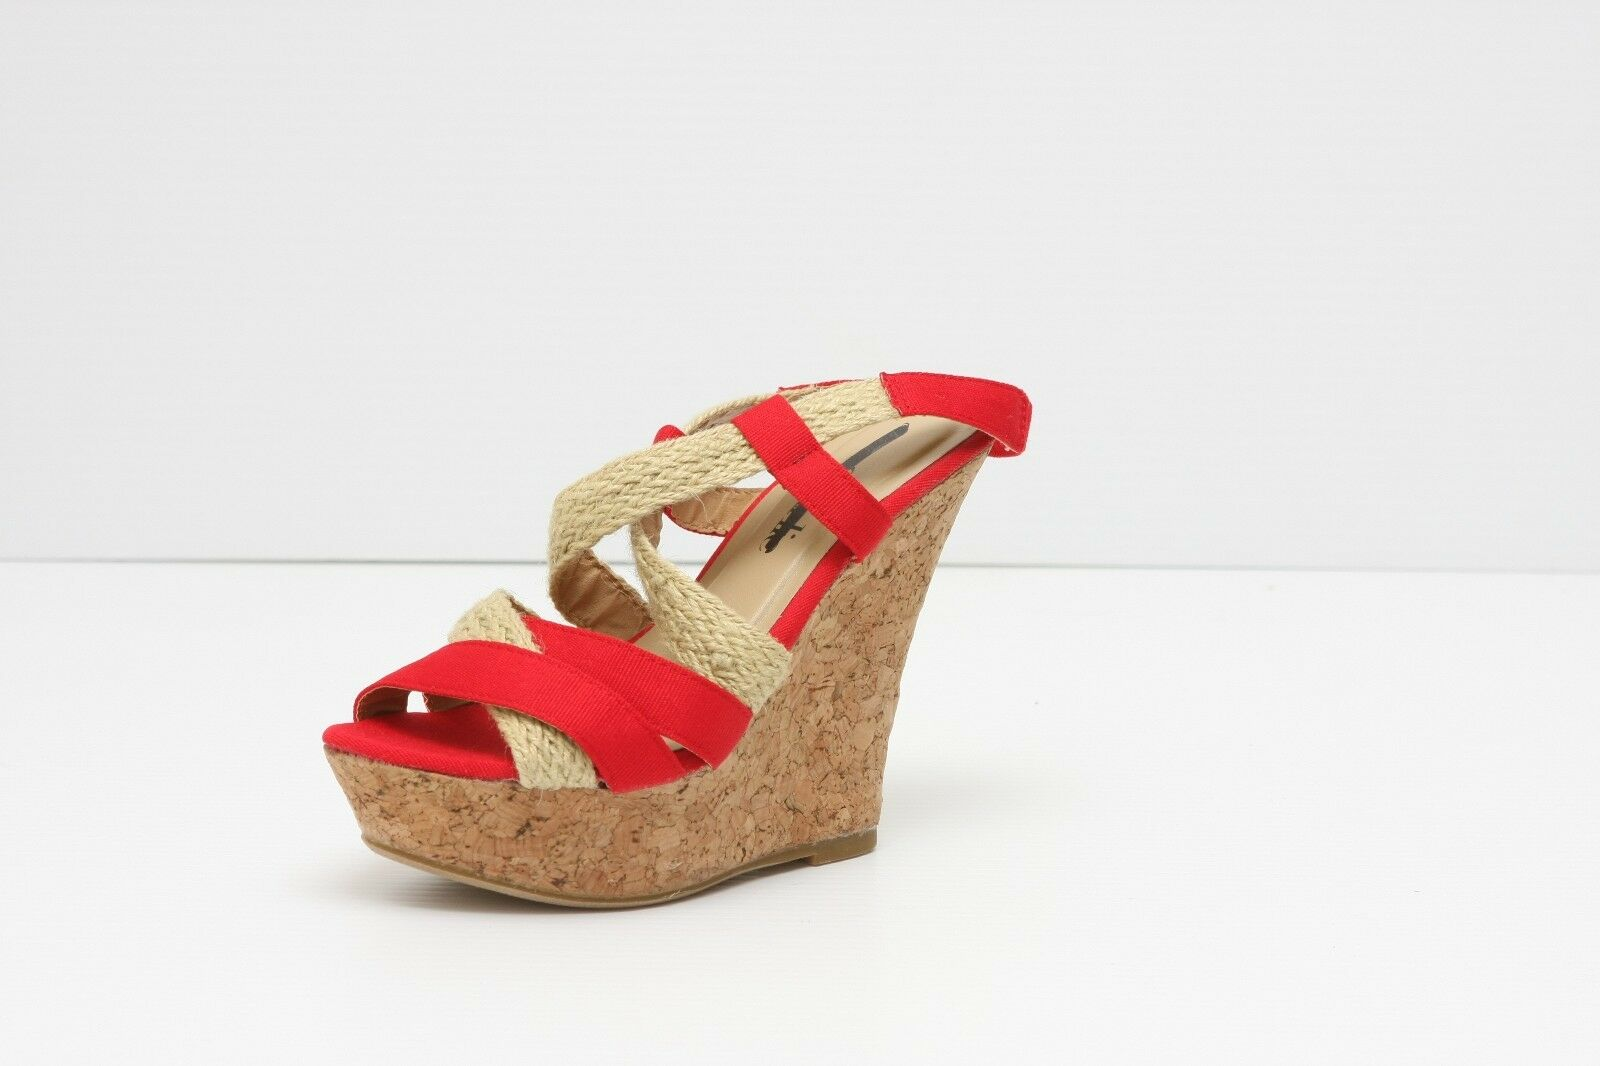 new charles par charles david sophie    s cork wedge sandales chaussures sz 7 1725b9